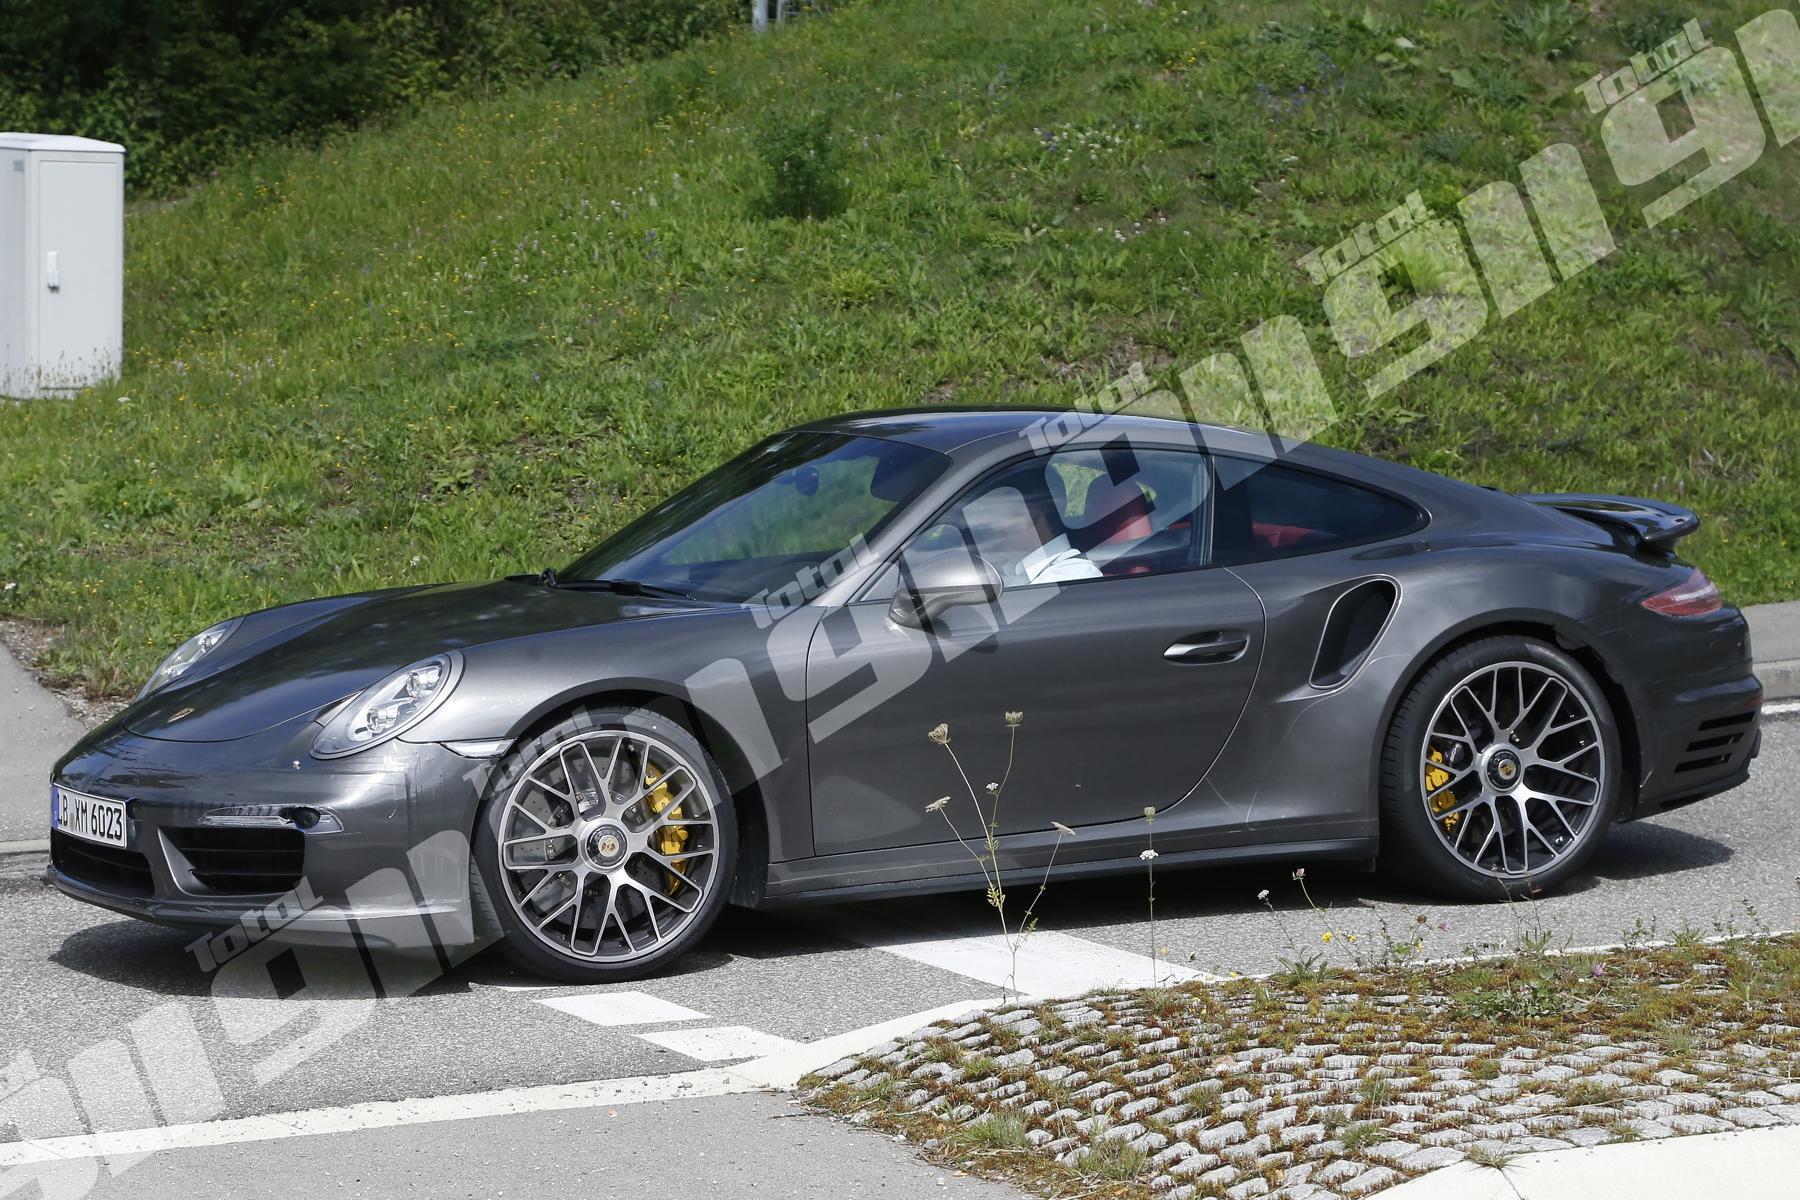 EXCLUSIVE New Porsche 911 Turbo S Spy Shots Put 992